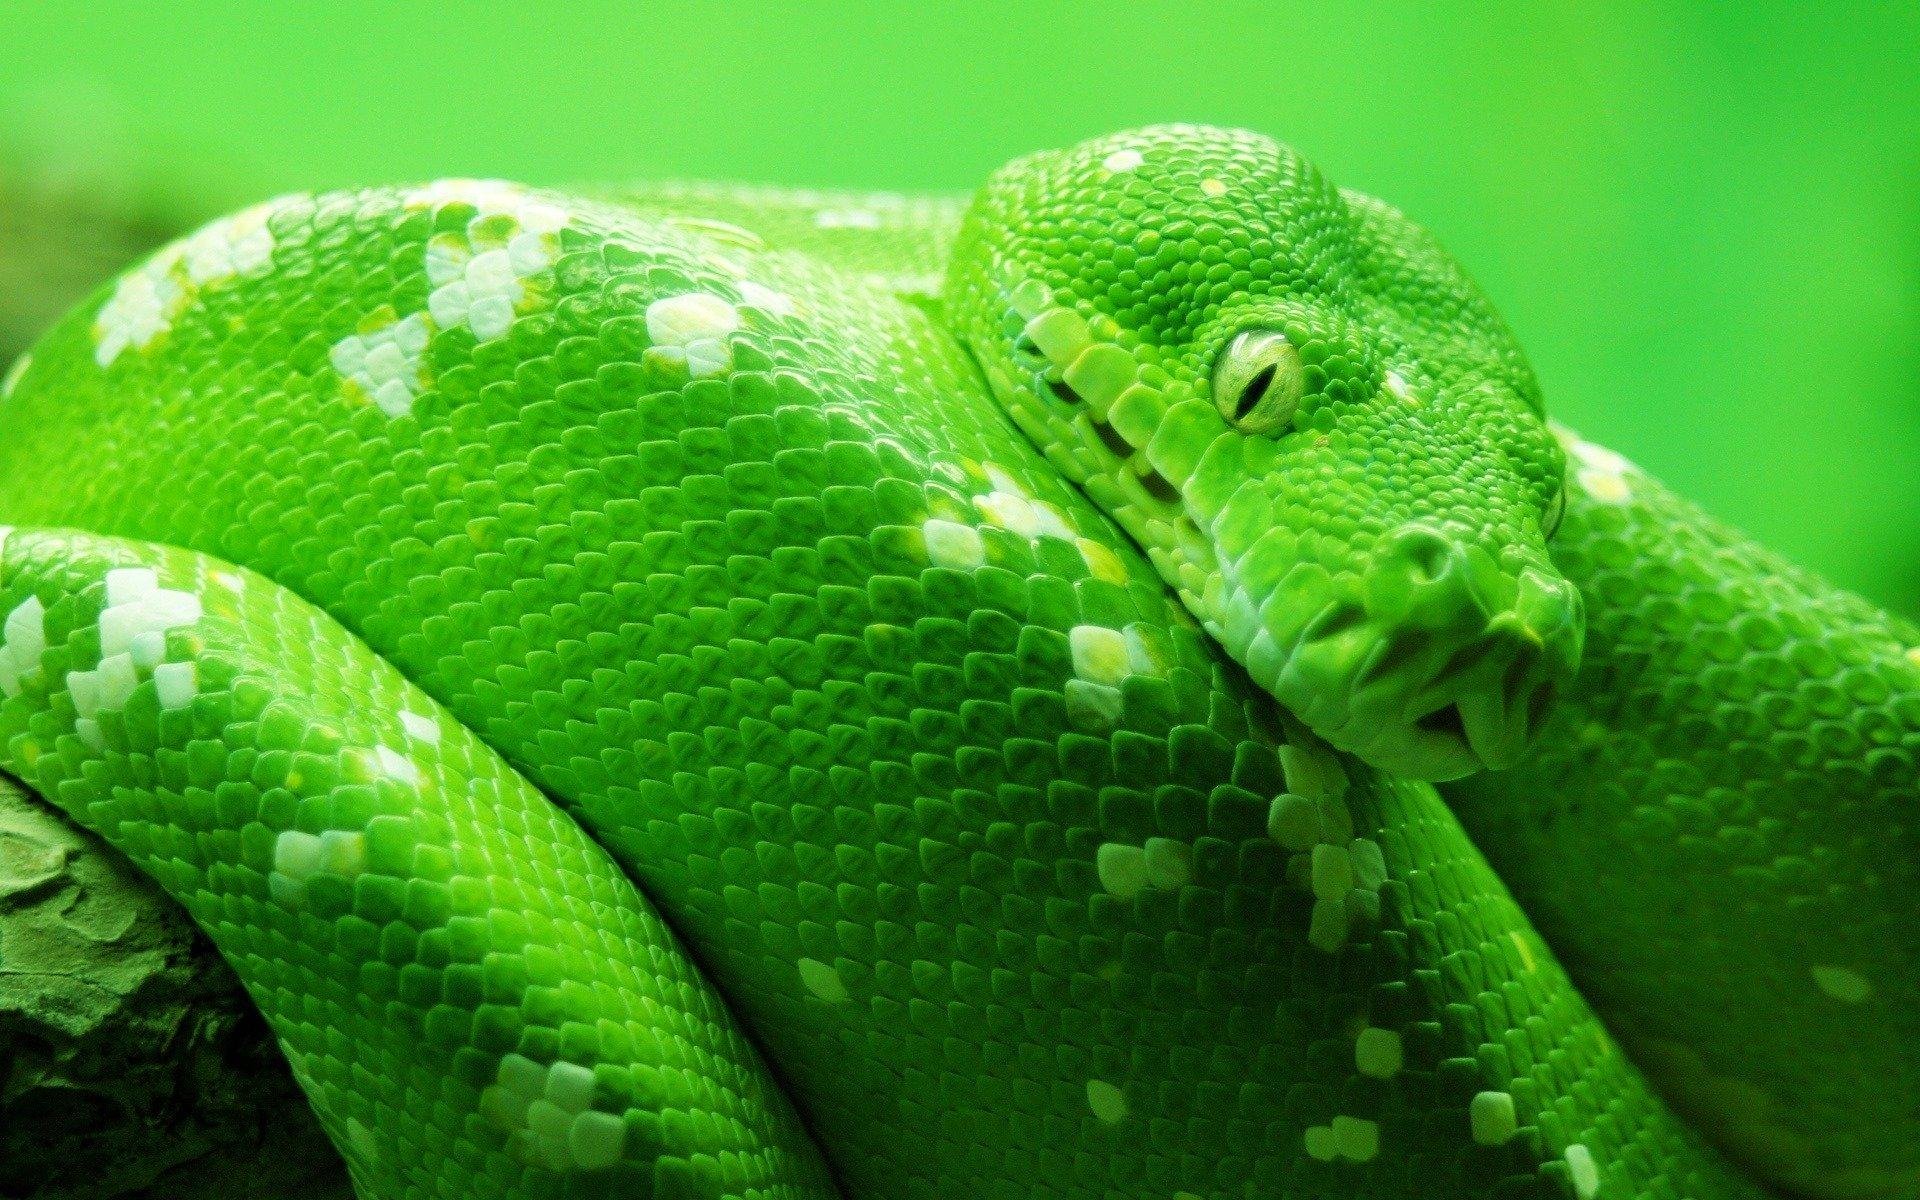 природа животные рептилия  № 234951 бесплатно